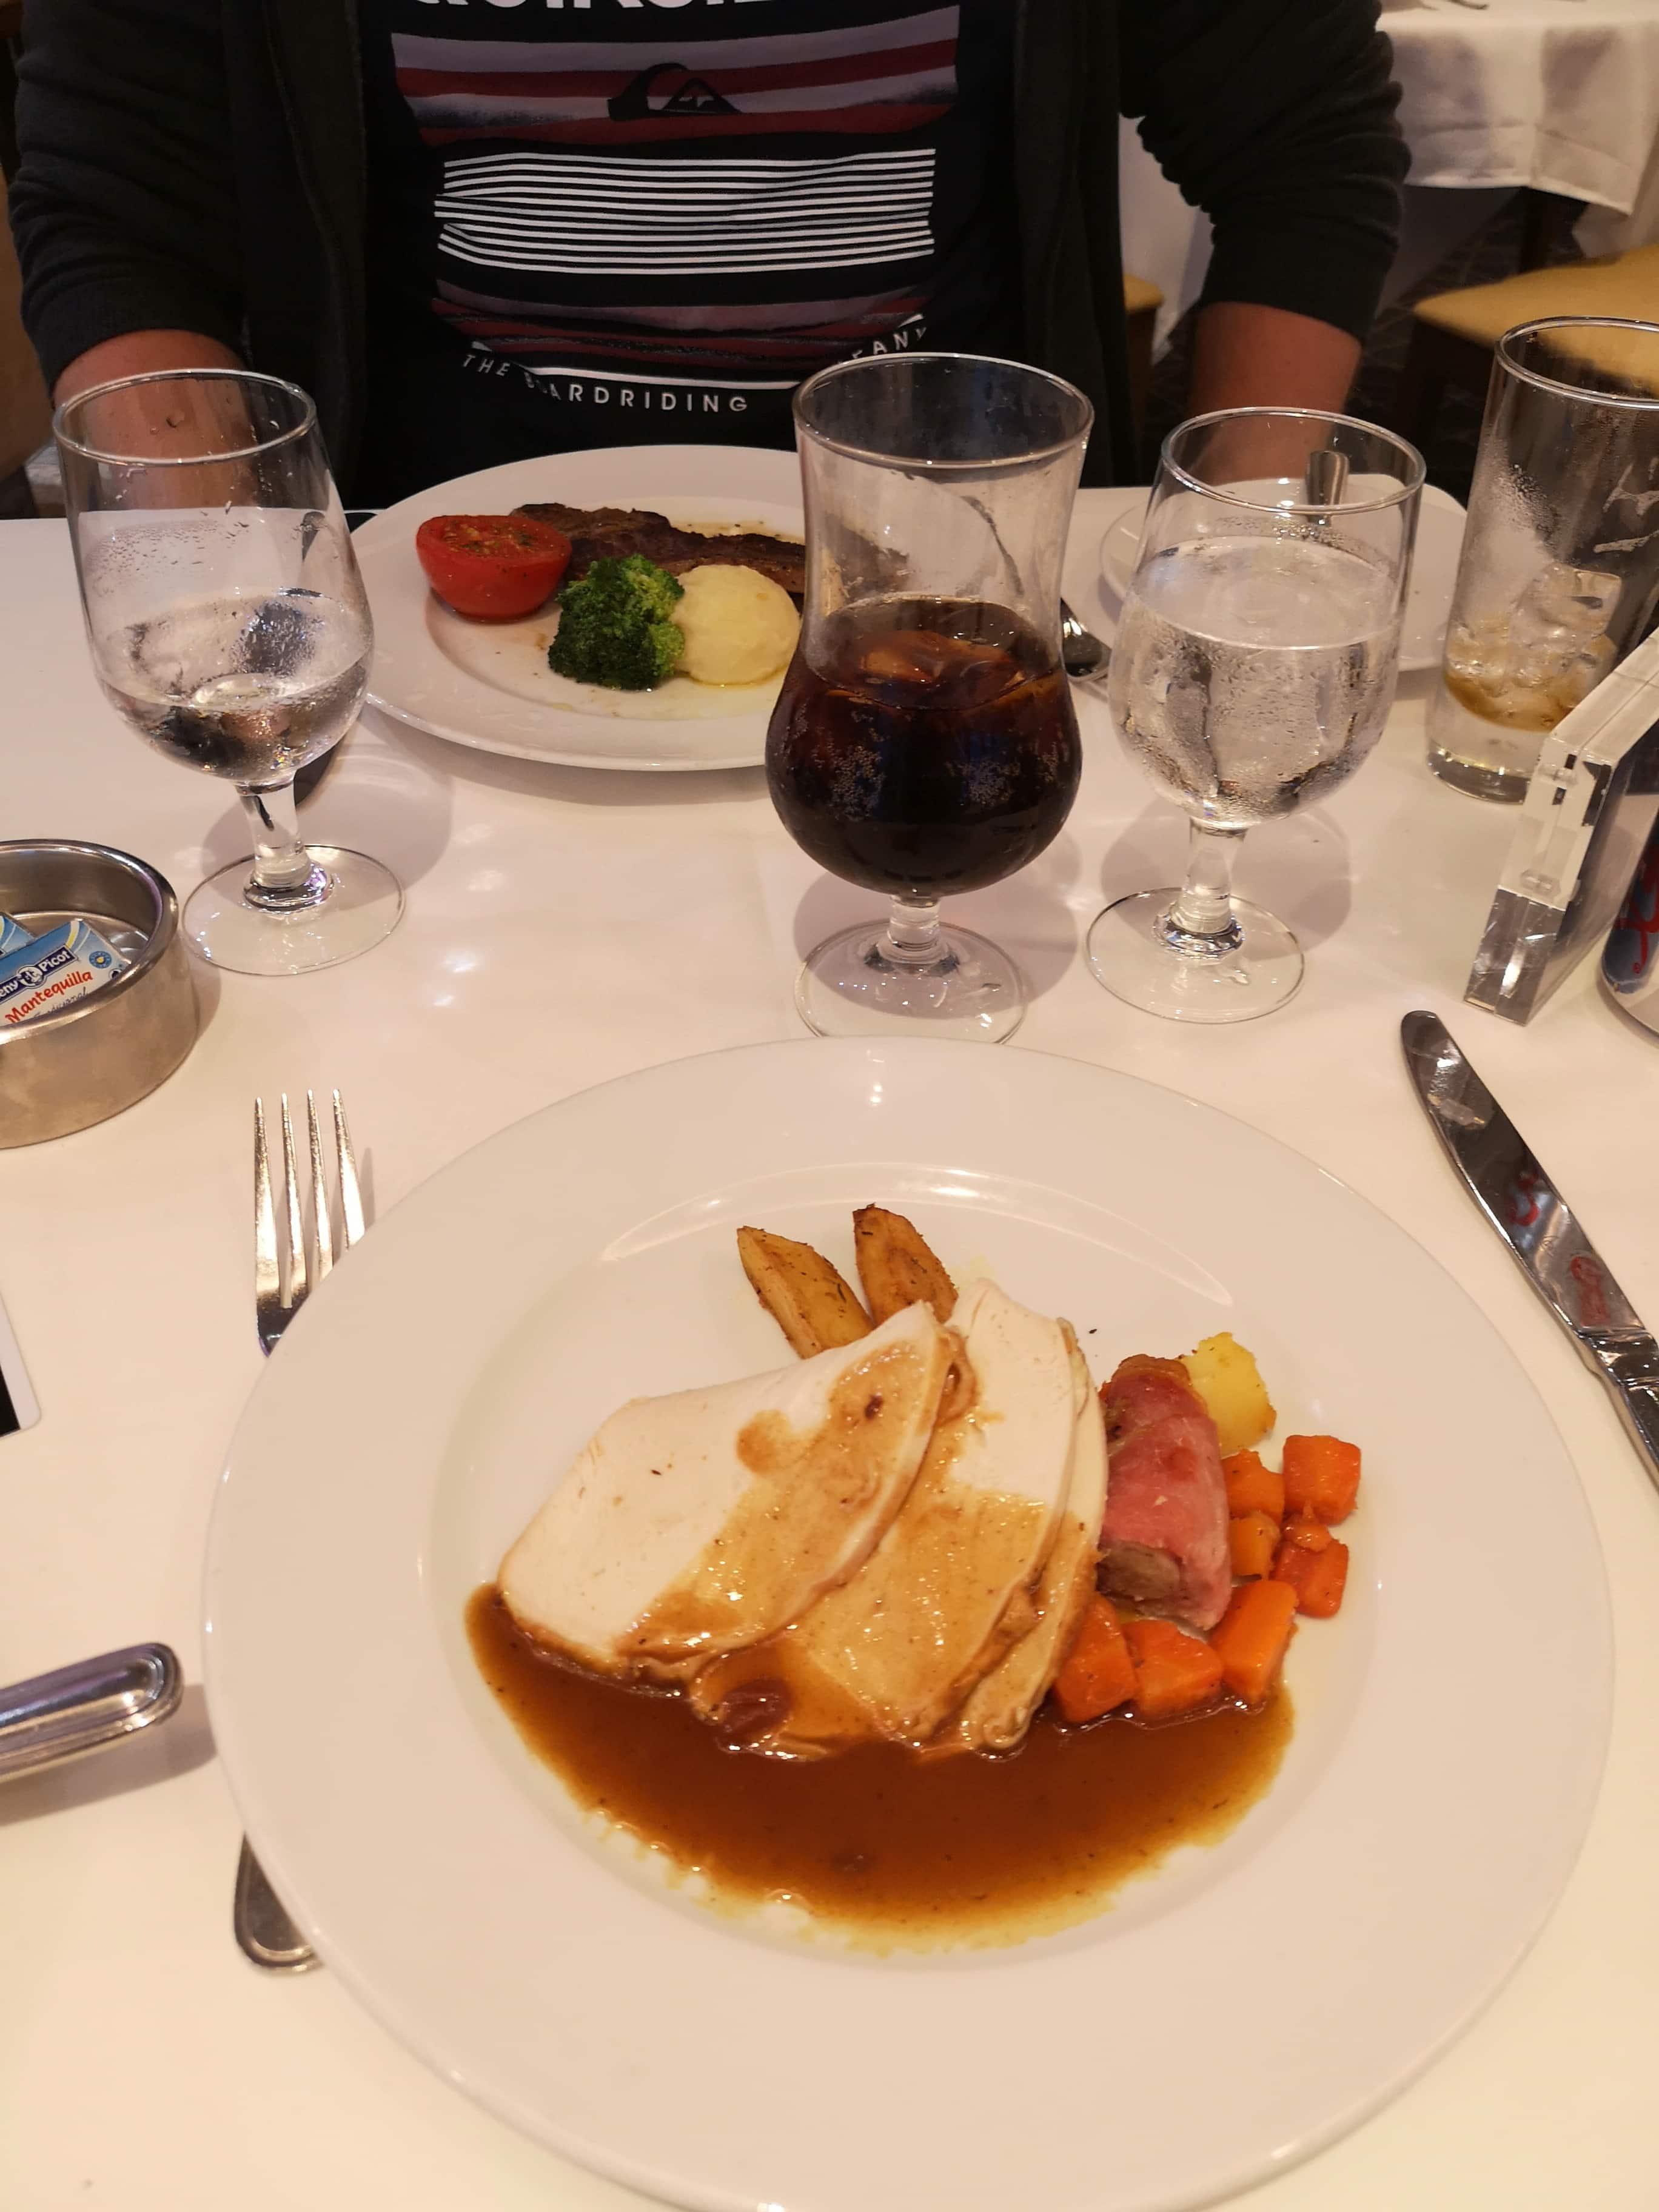 Marella Discovery Main Dining Room Turkey  47 degrees